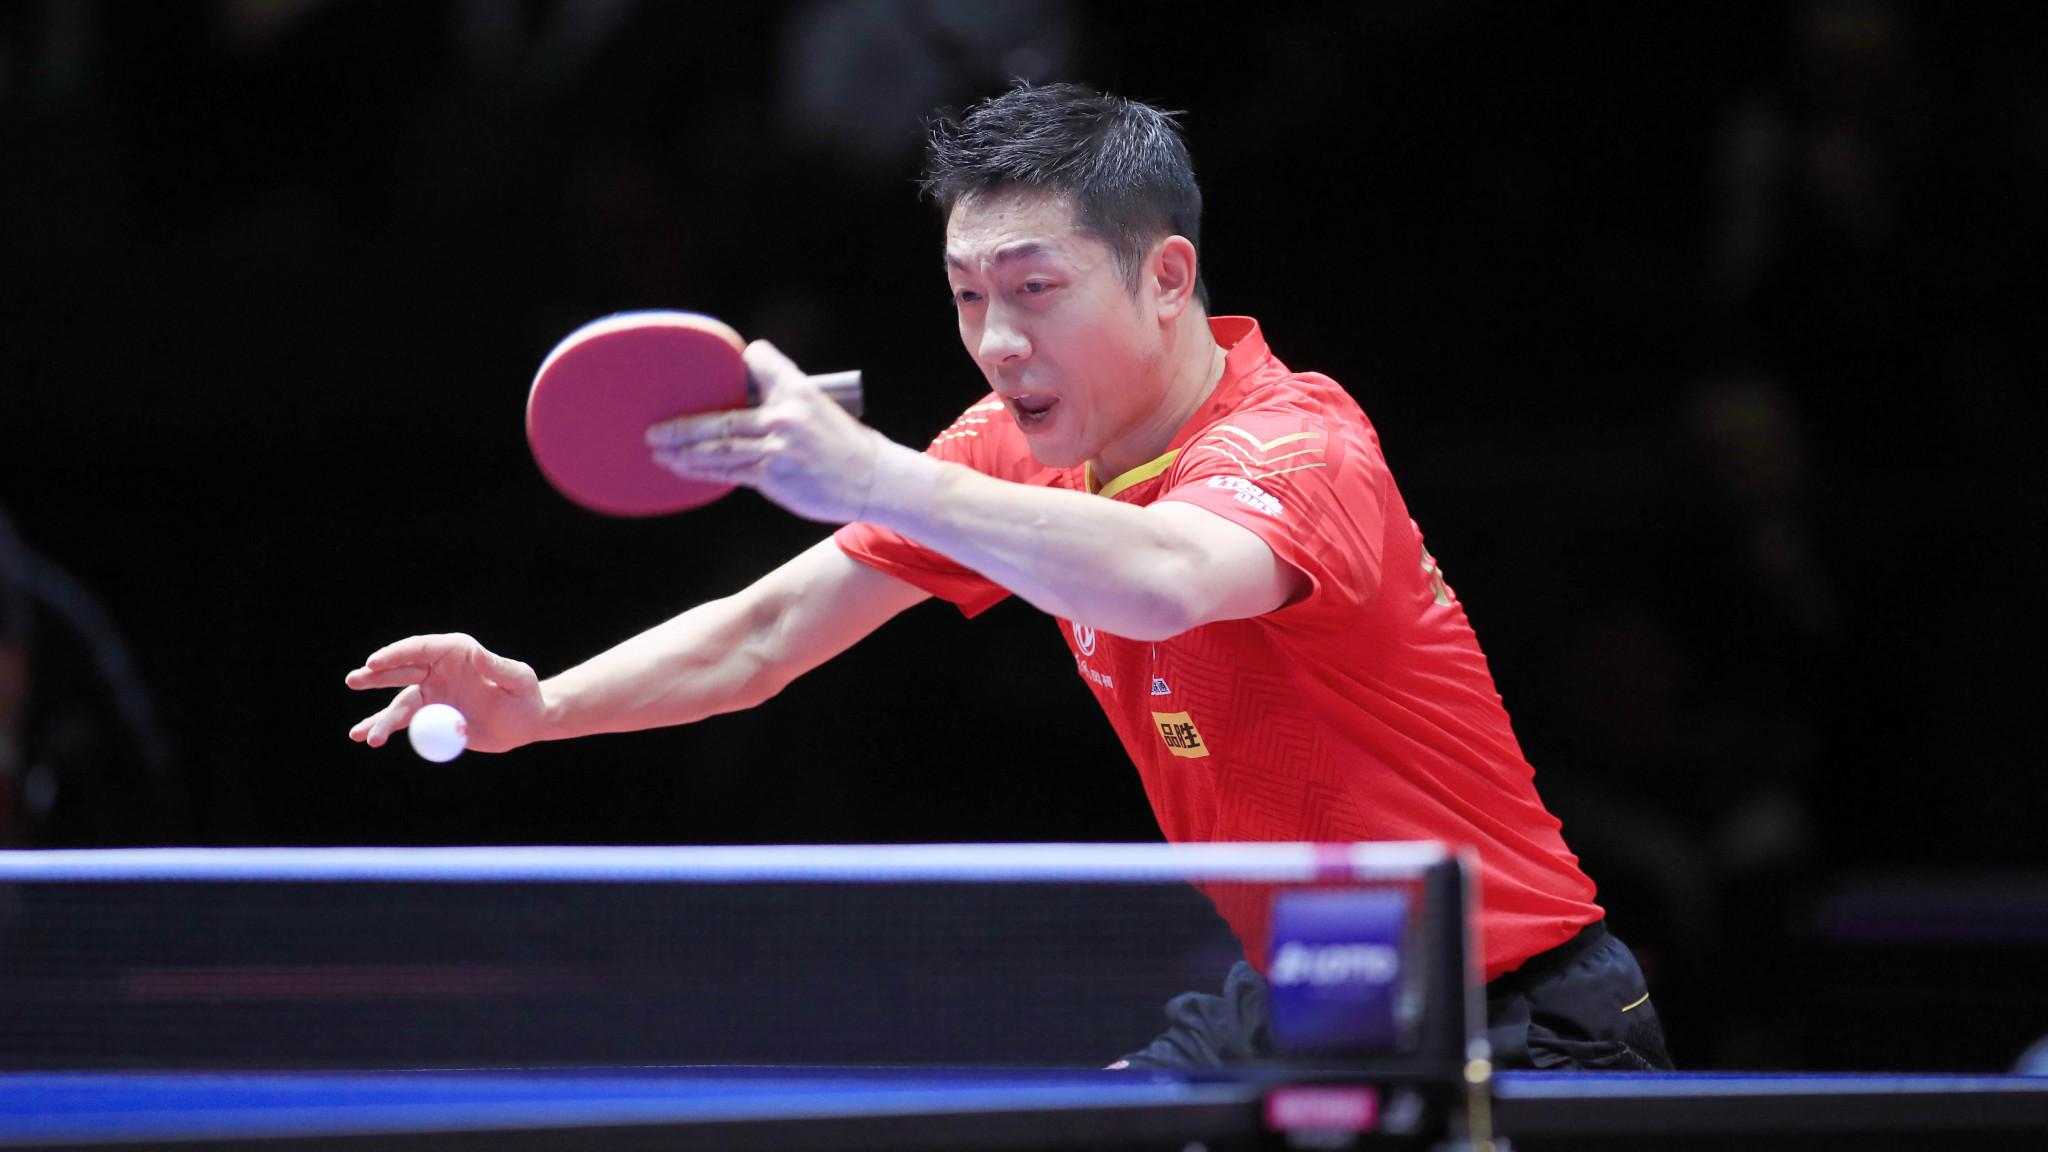 Xu Xin won the men's singles title at the ITTF German Open ©Rémy Gros/ITTF